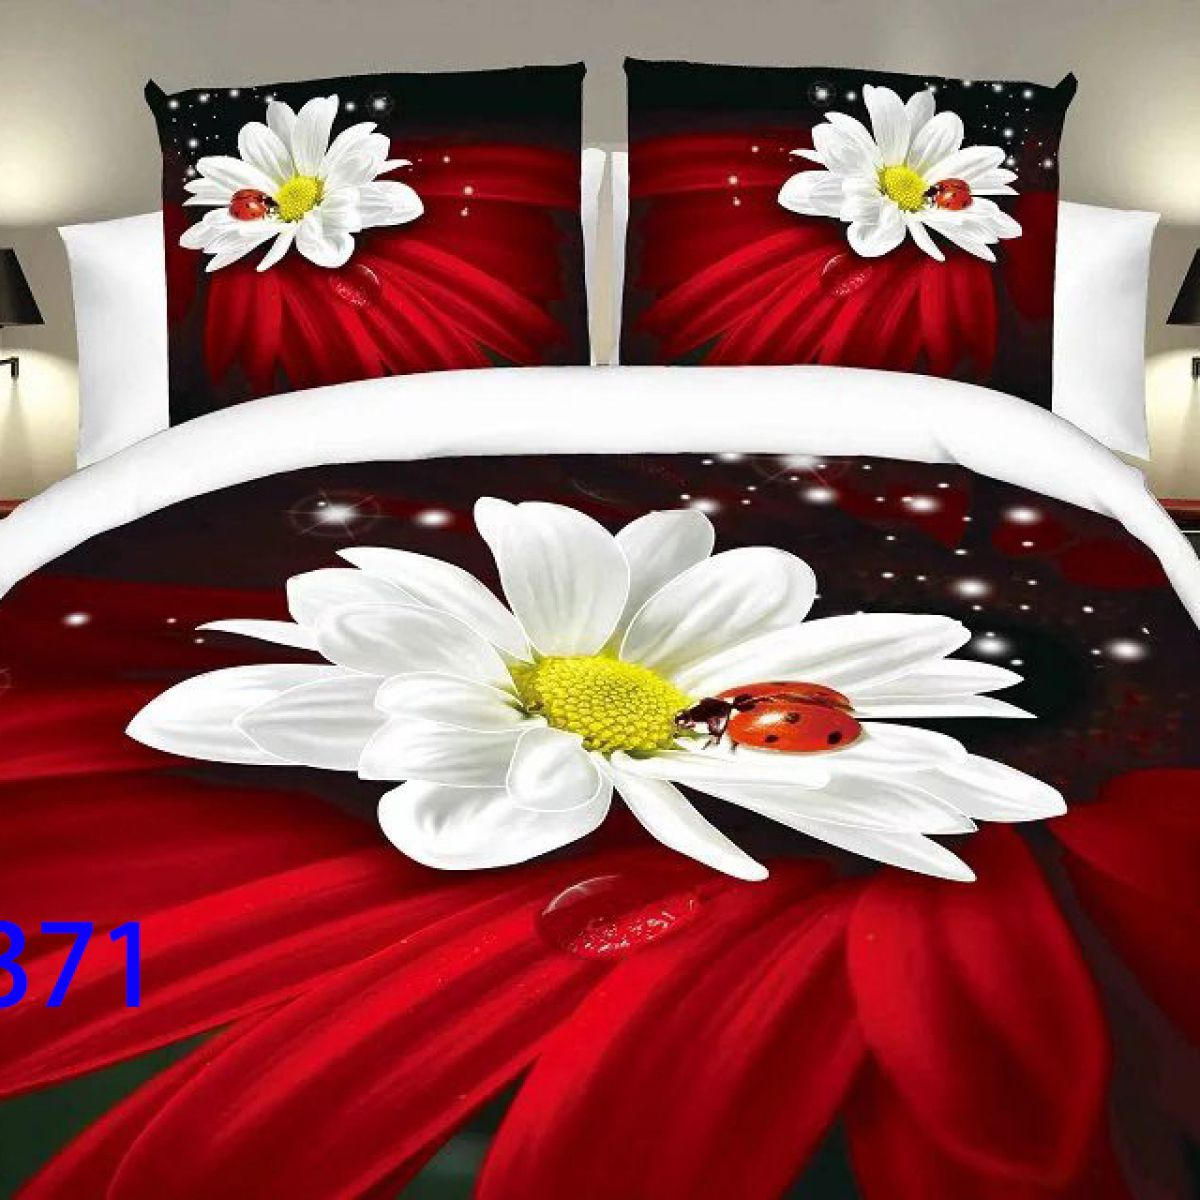 3D Beddings - Antonio - AML-371 - 160x200 cm - 4 pcs